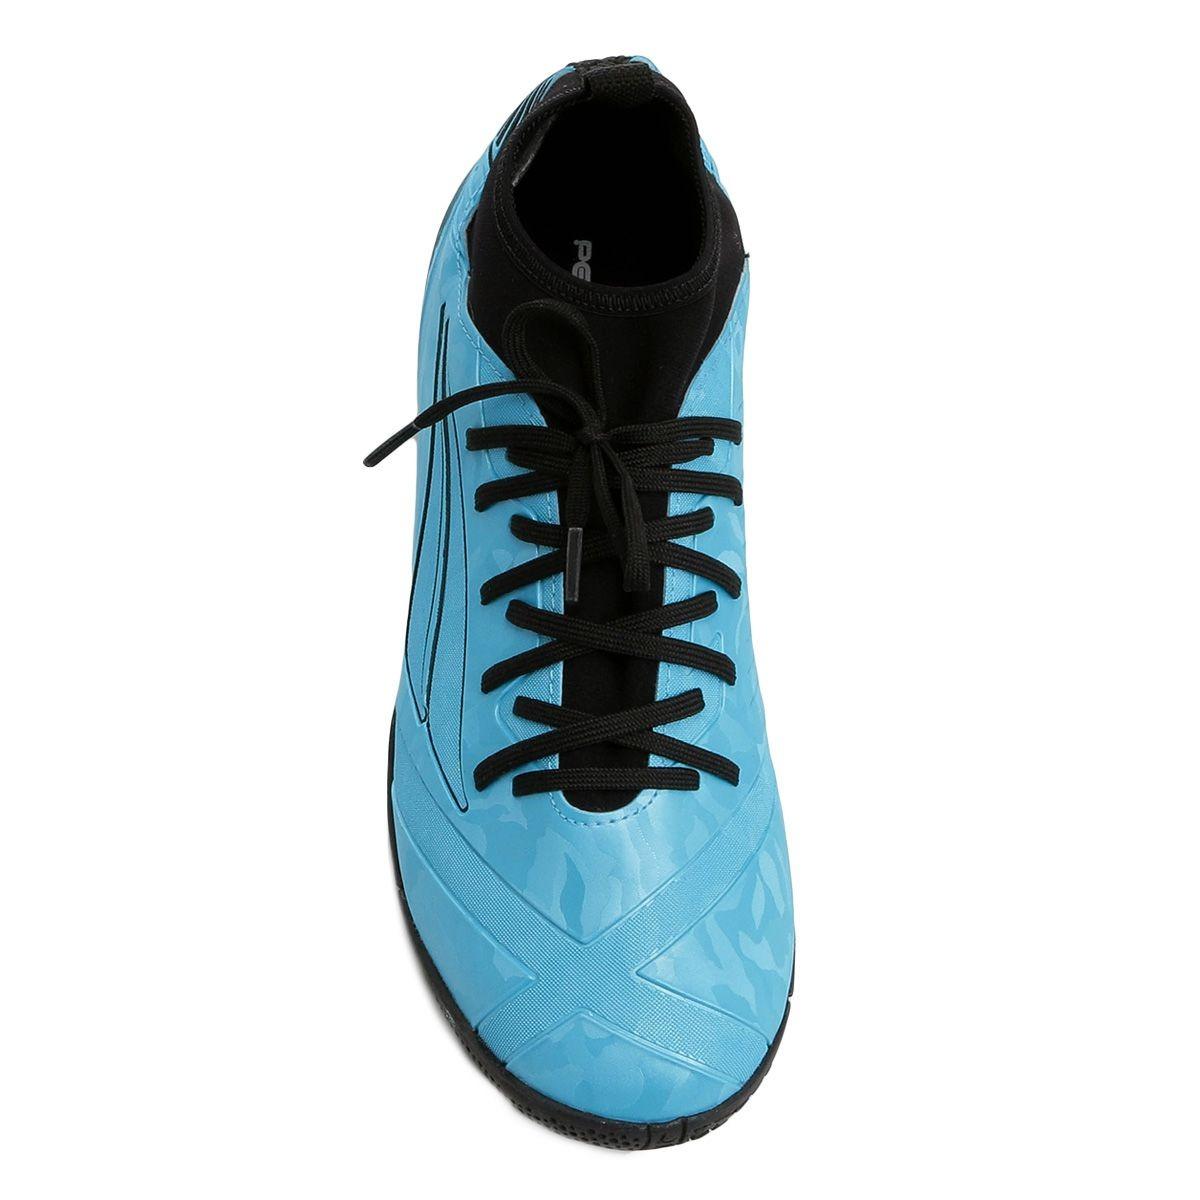 Tenis Futsal Penalty Locker Stealth 7 Botinha Adulto + Frete - R ... d6ac9608eed88